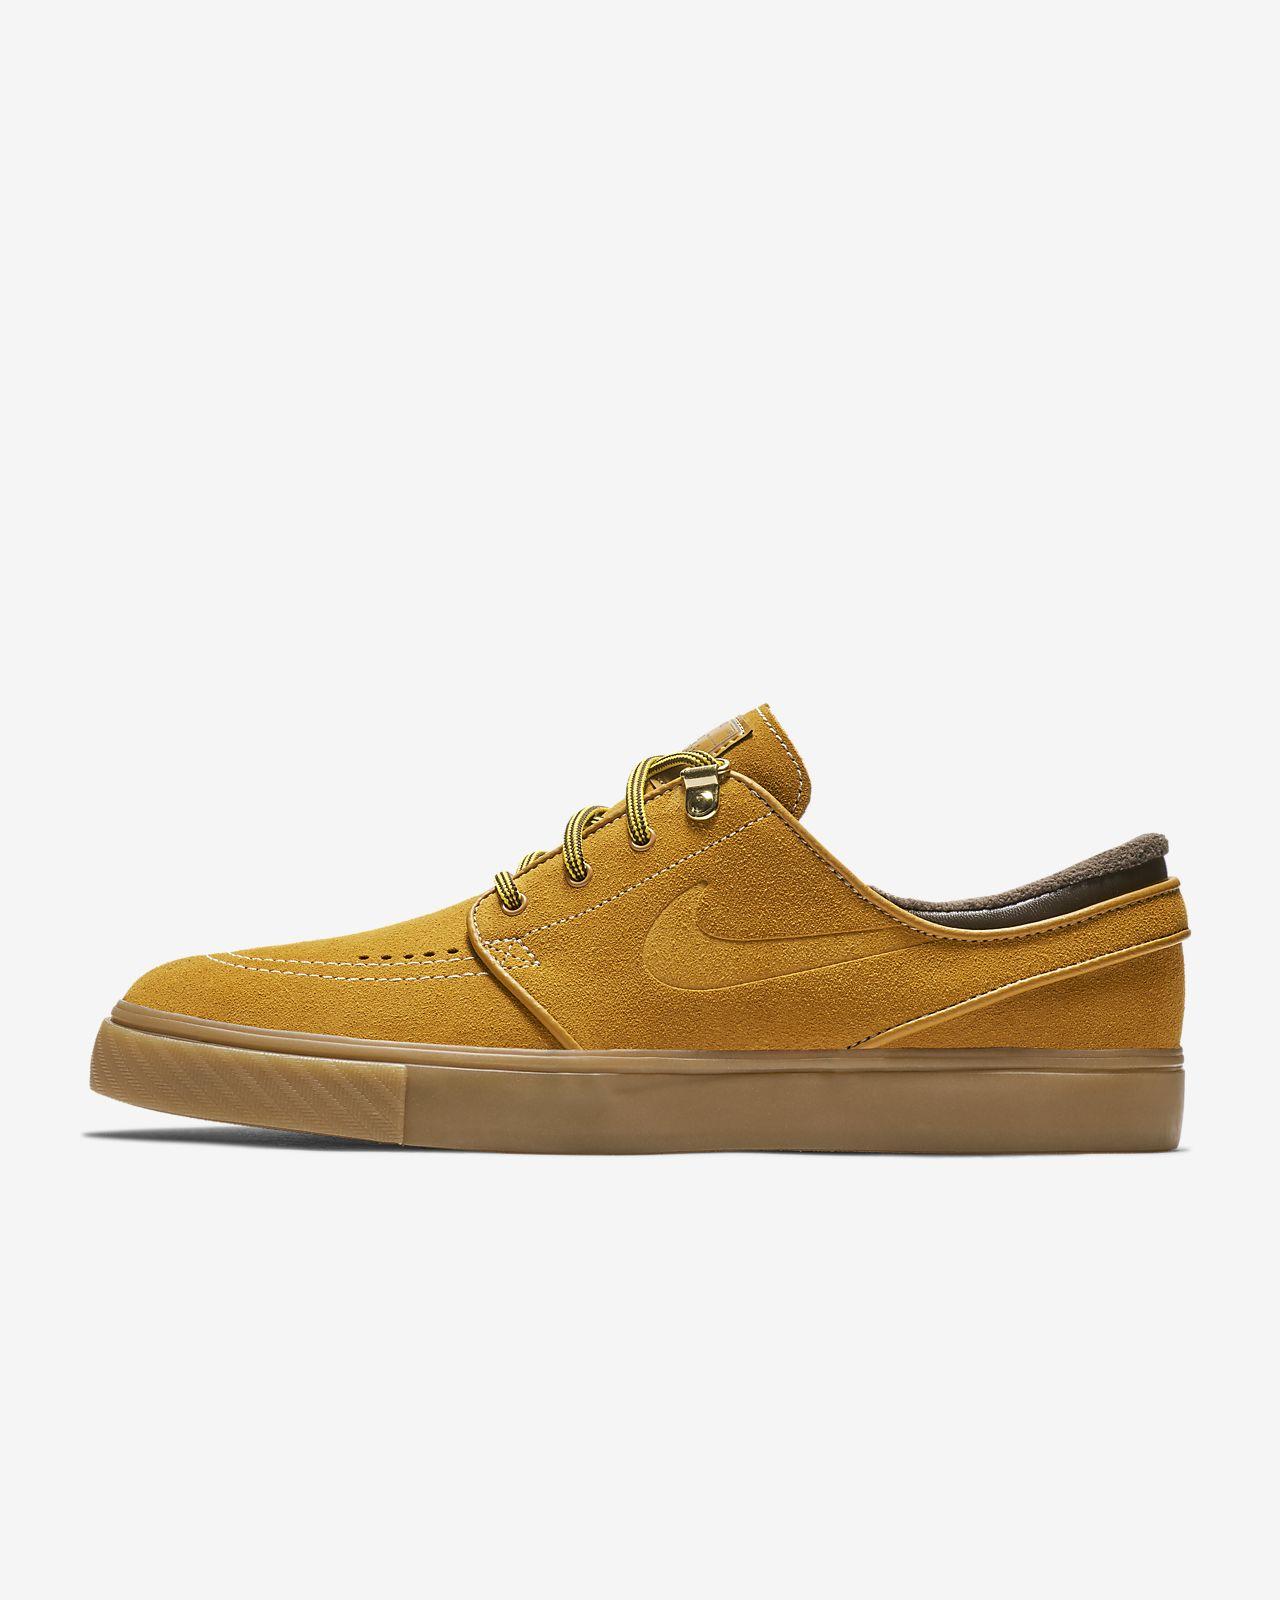 Nike SB Zoom Janoski Premium Skateboarding Shoe